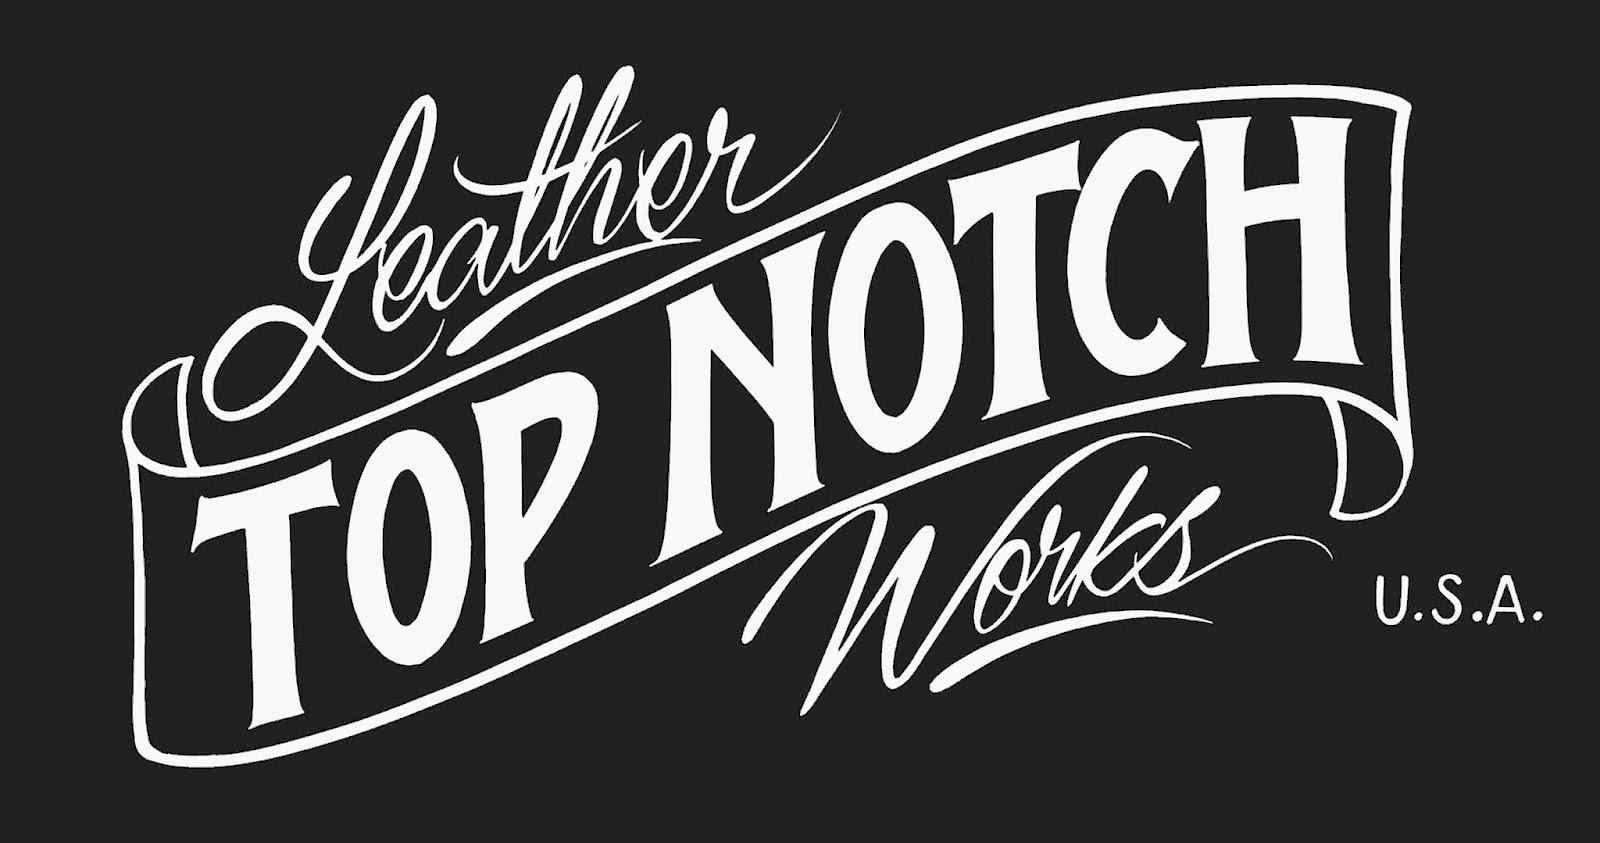 http://topnotchleatherworks.bigcartel.com/